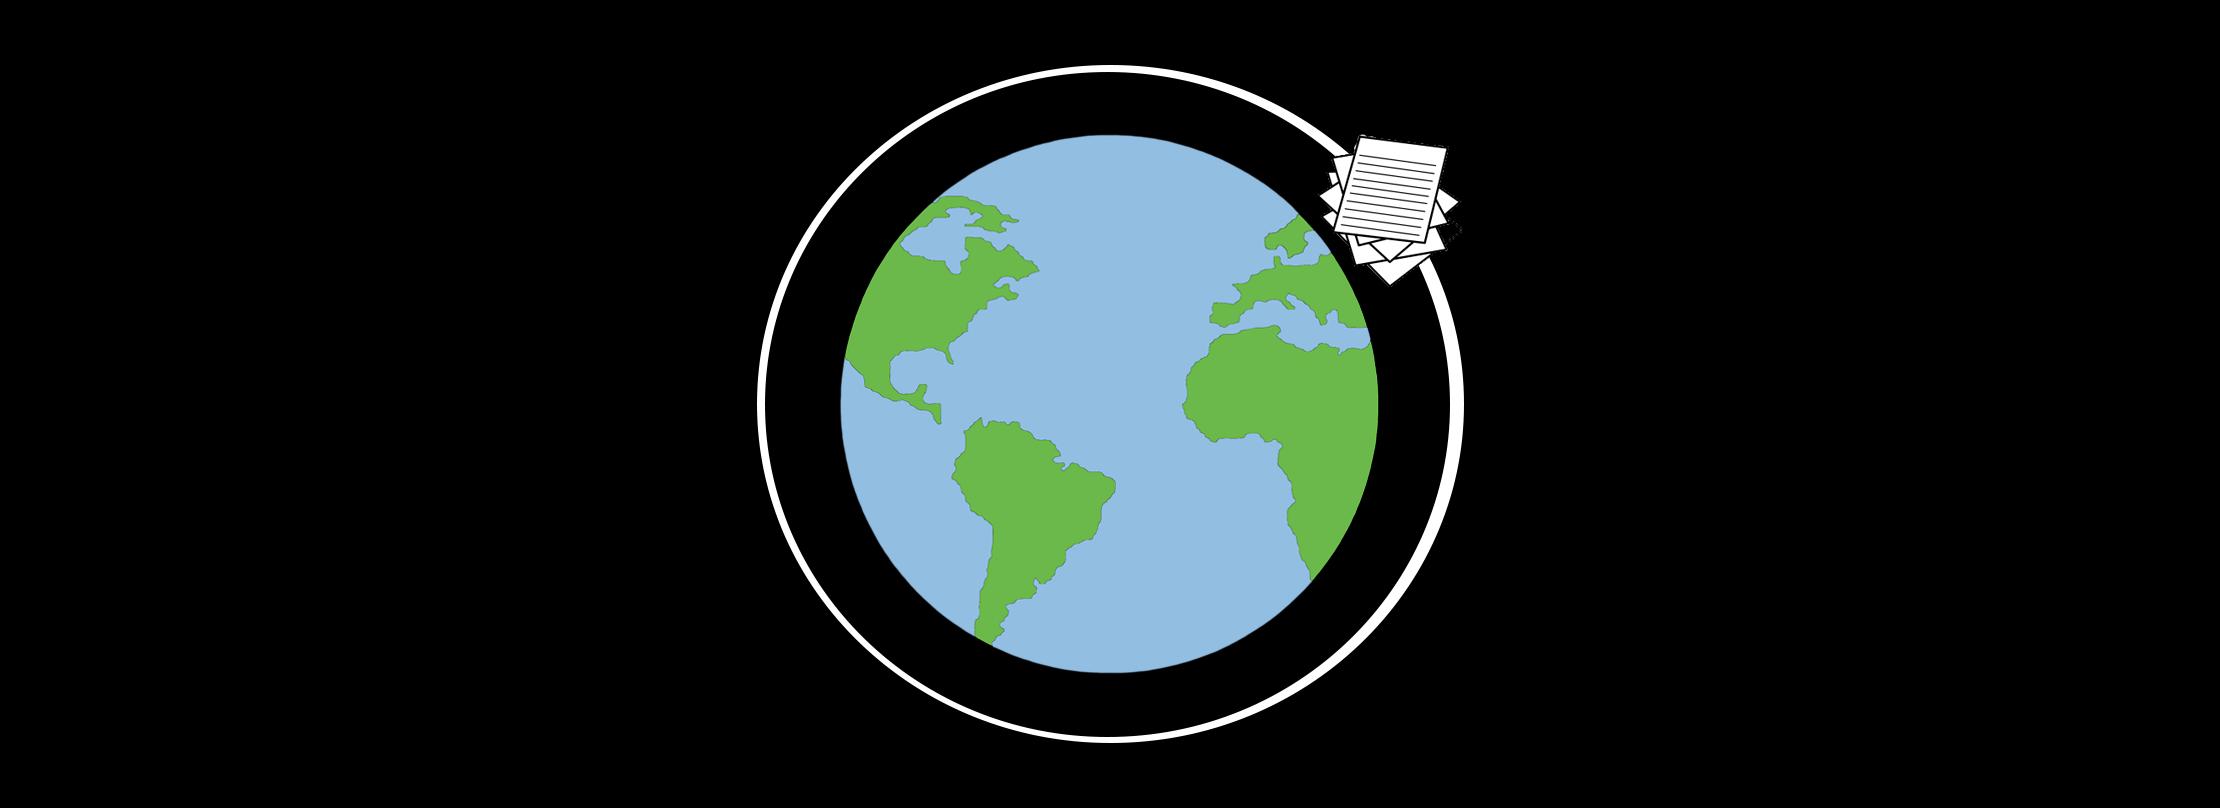 Satellite communication and regulation